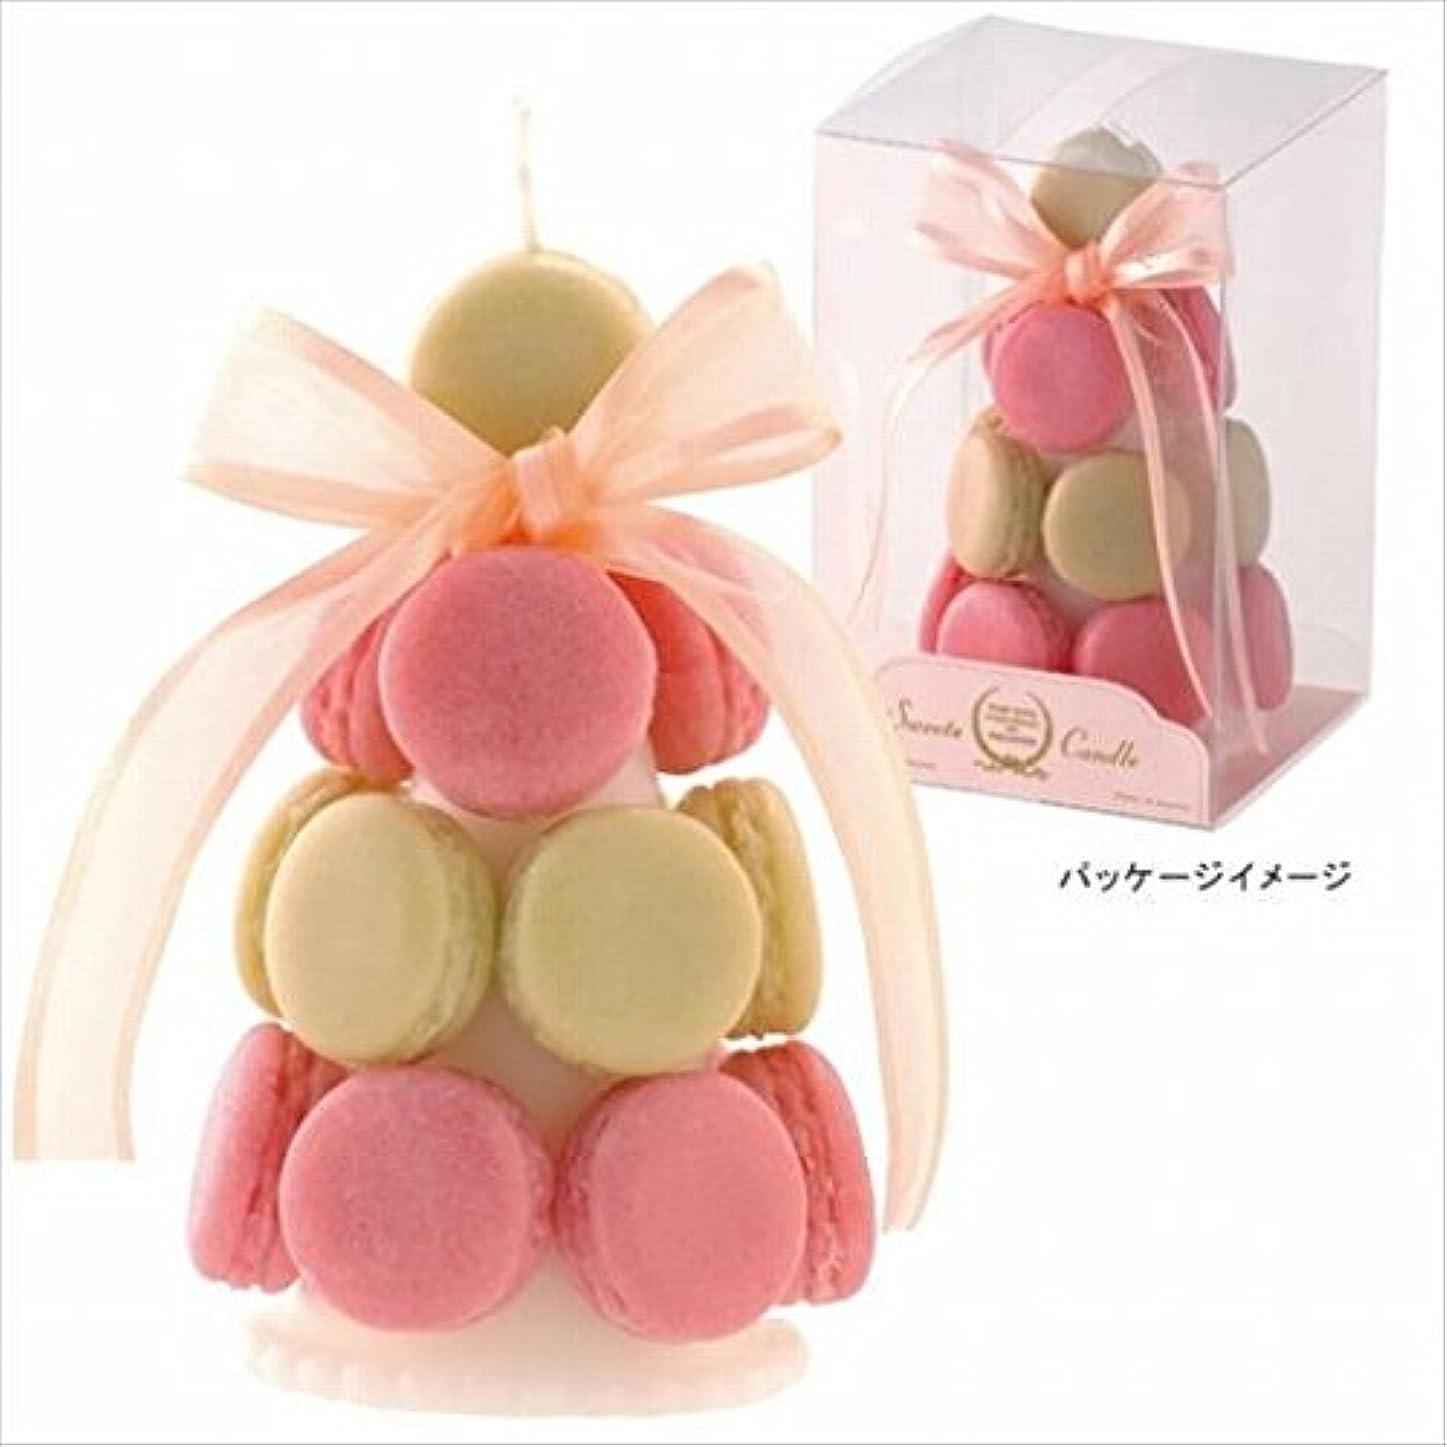 kameyama candle(カメヤマキャンドル) ハッピーマカロンタワー 「 キャラメル 」6個セット(A4580510)